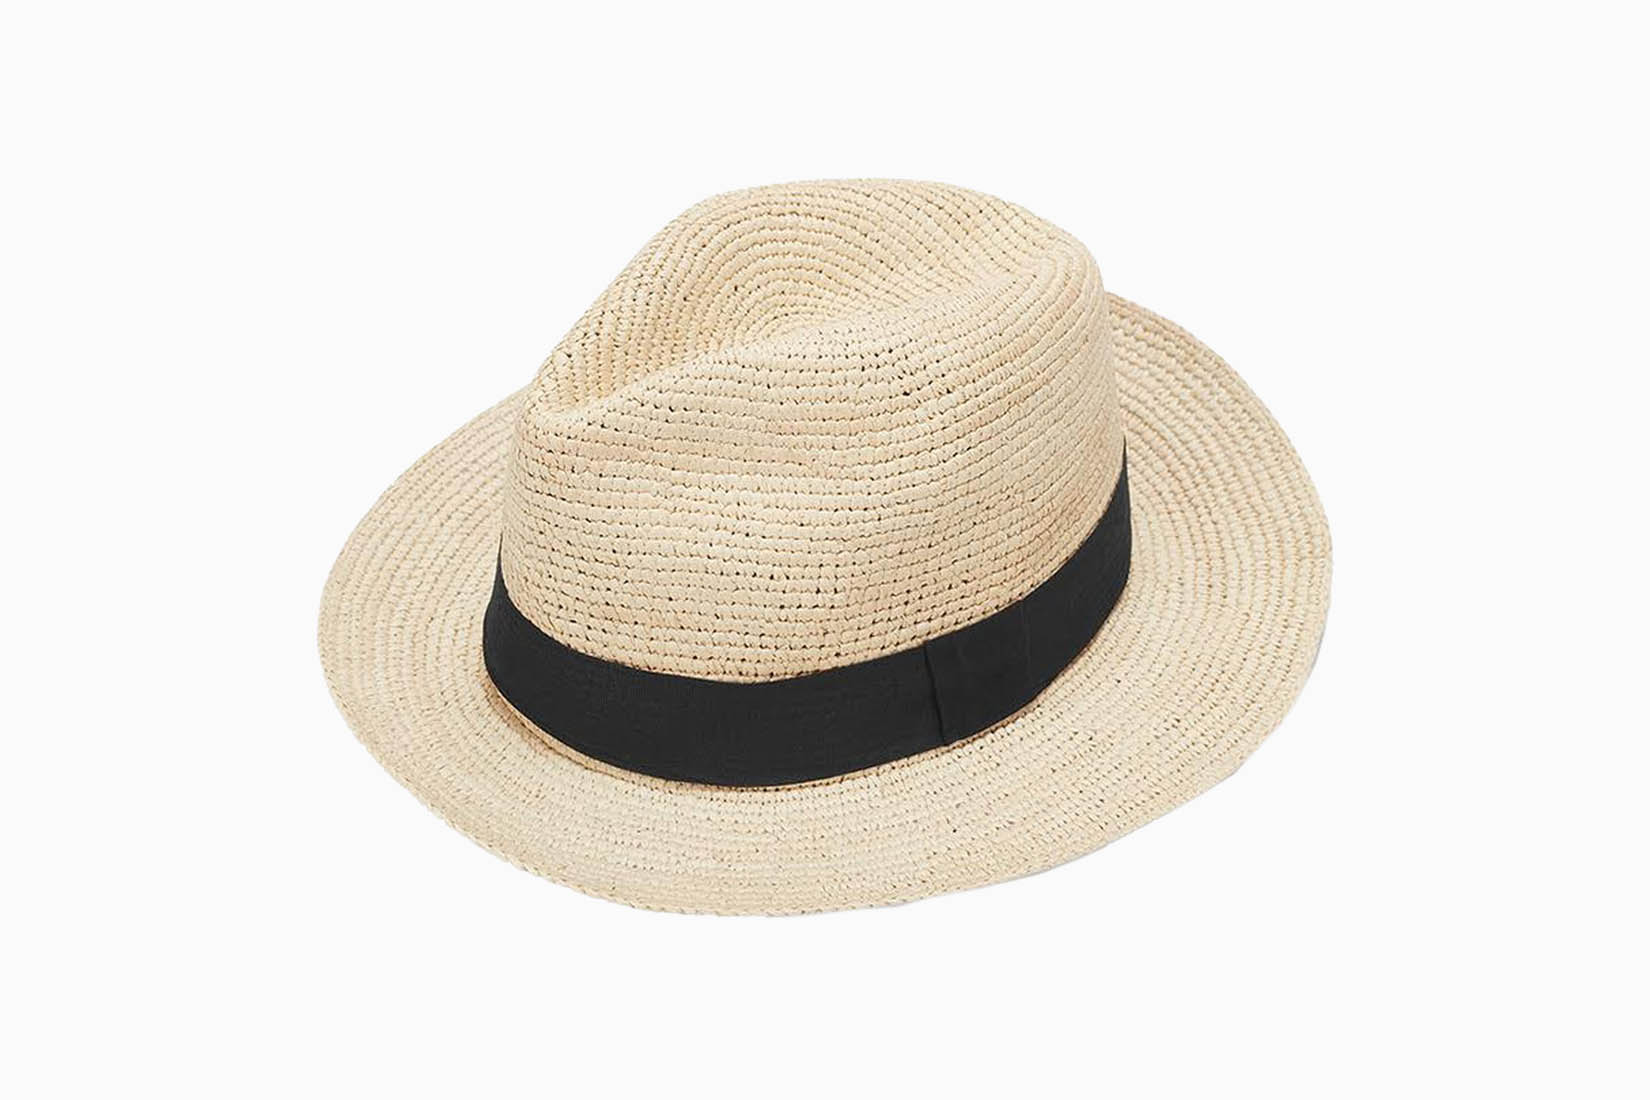 best sun hats women review Cuyana Folding Panama Luxe Digital